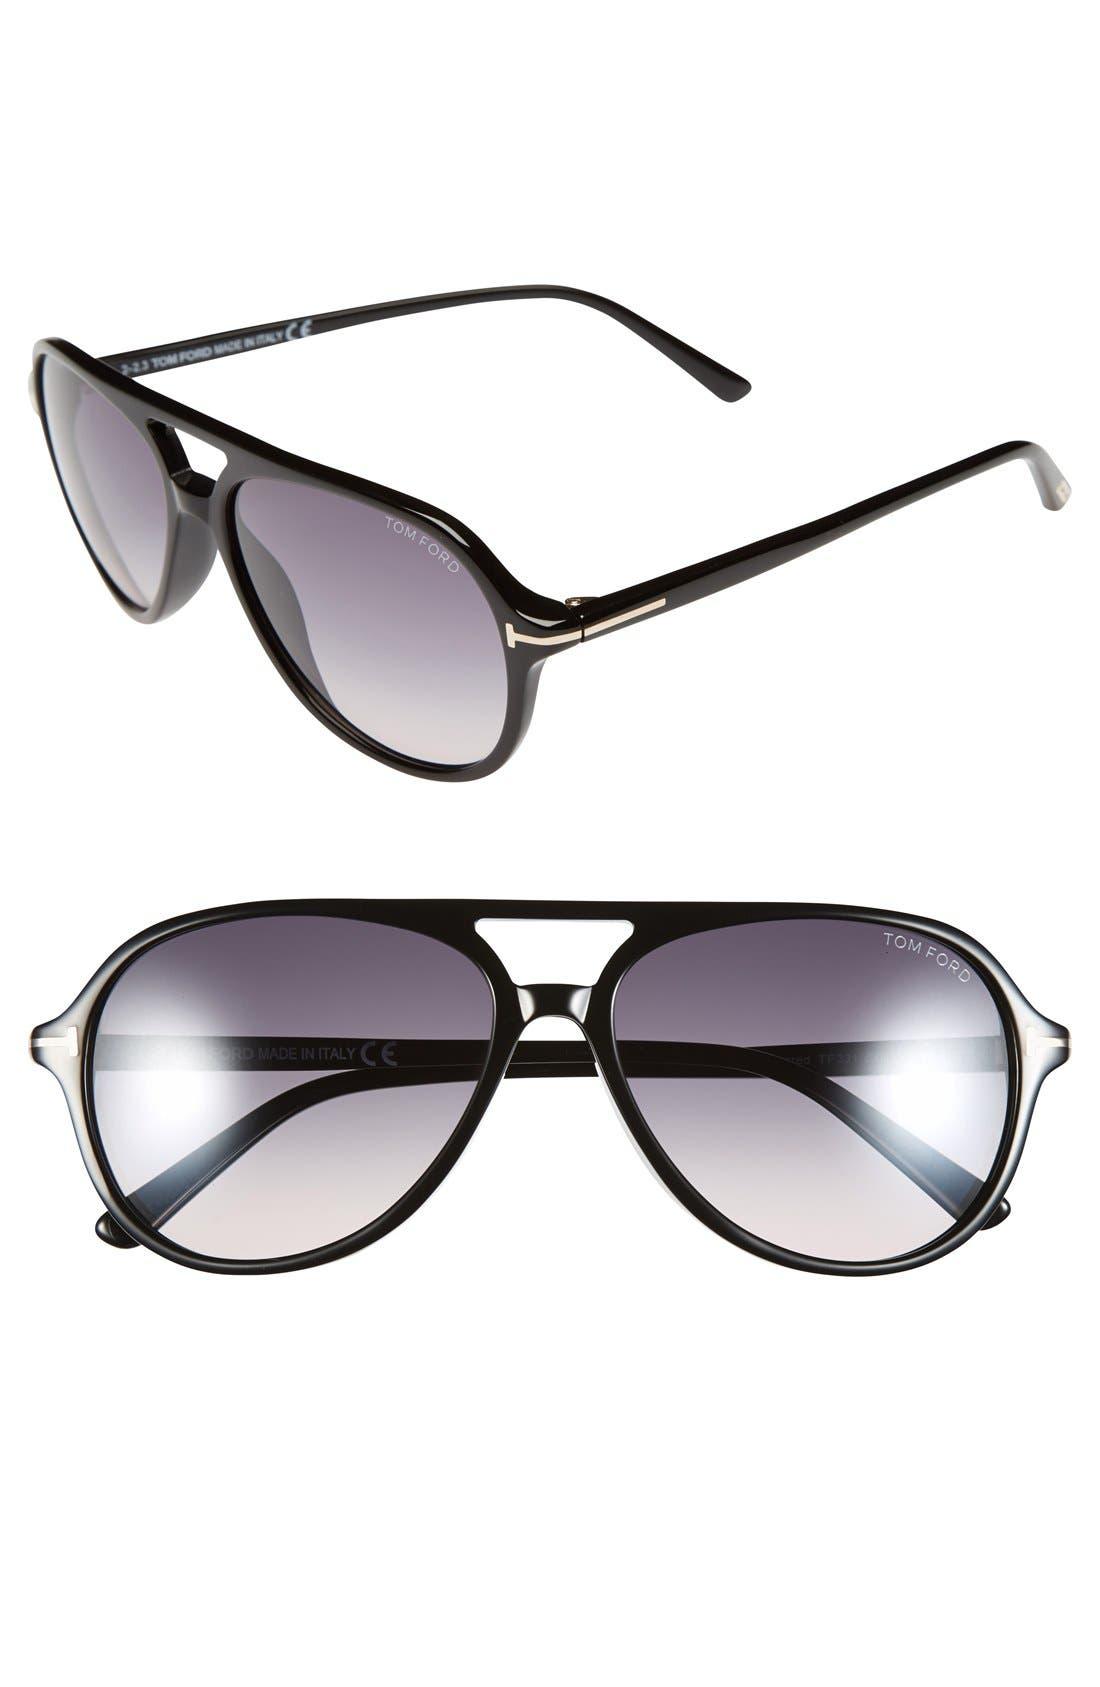 Alternate Image 1 Selected - Tom Ford 'Jared' 58mm Sunglasses